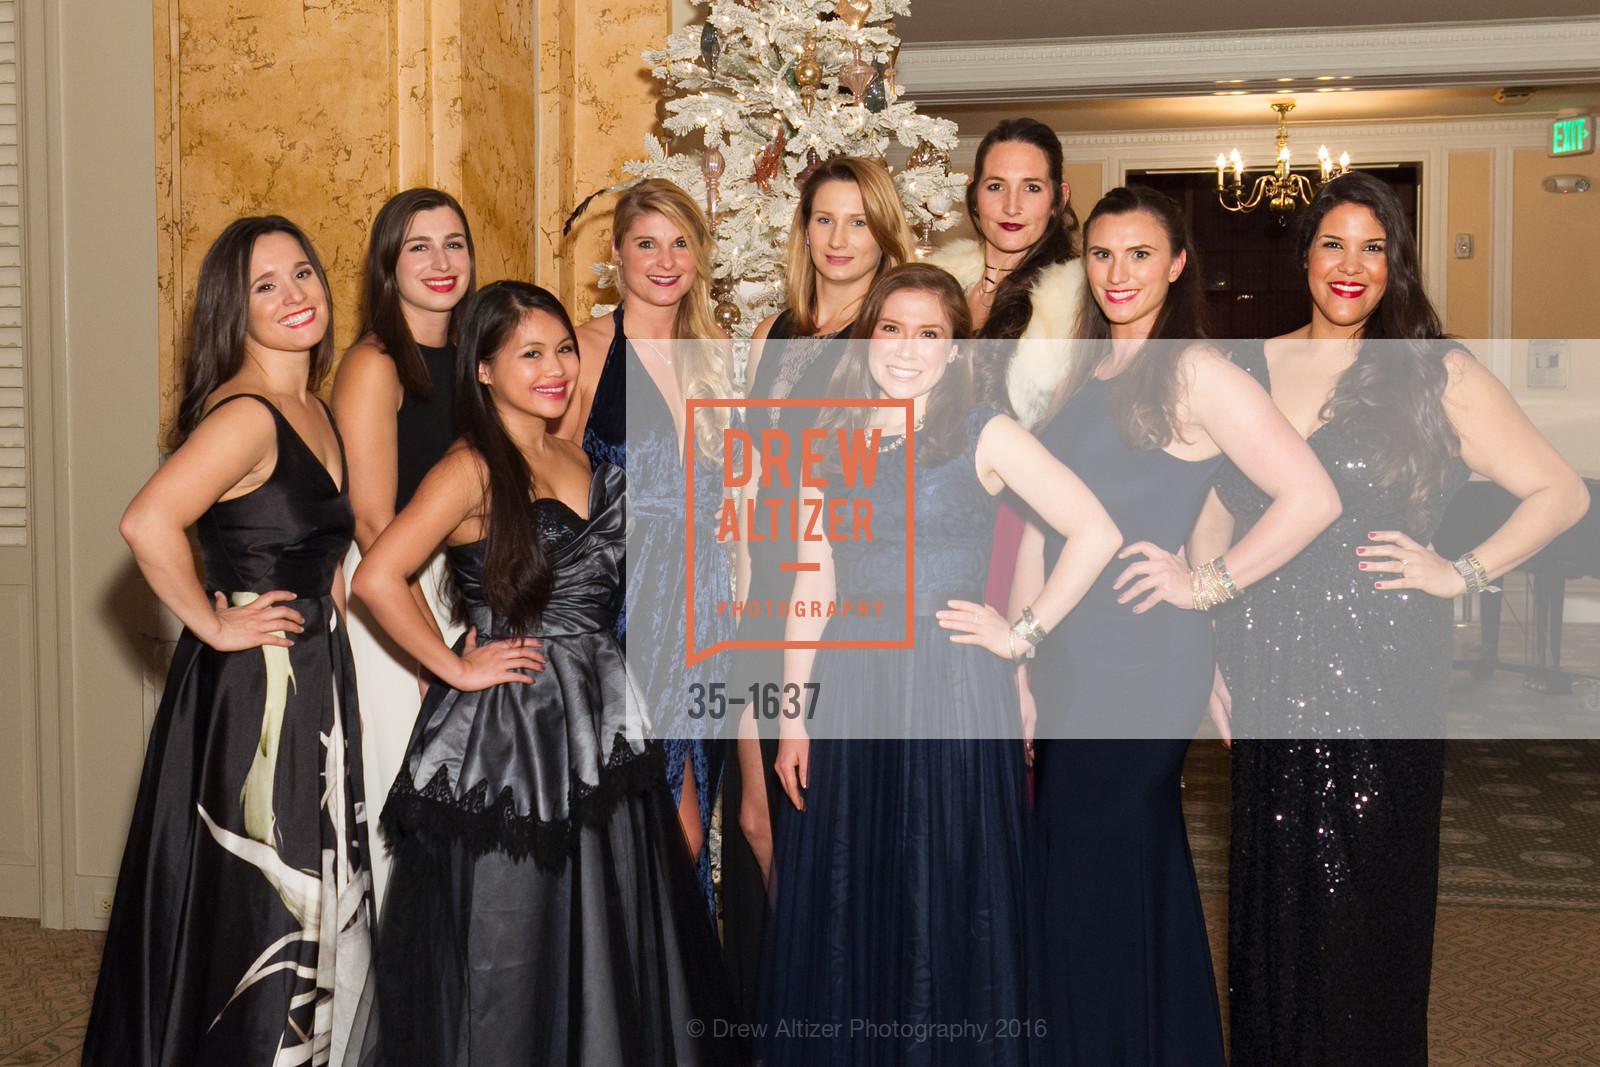 Libby Orrick, Julia Thompson, Melissa Floirendo, Lauren Gehring, Mara Giarratana Young, Danielle Schraner, Jaclyn Butler, Photo #35-1637